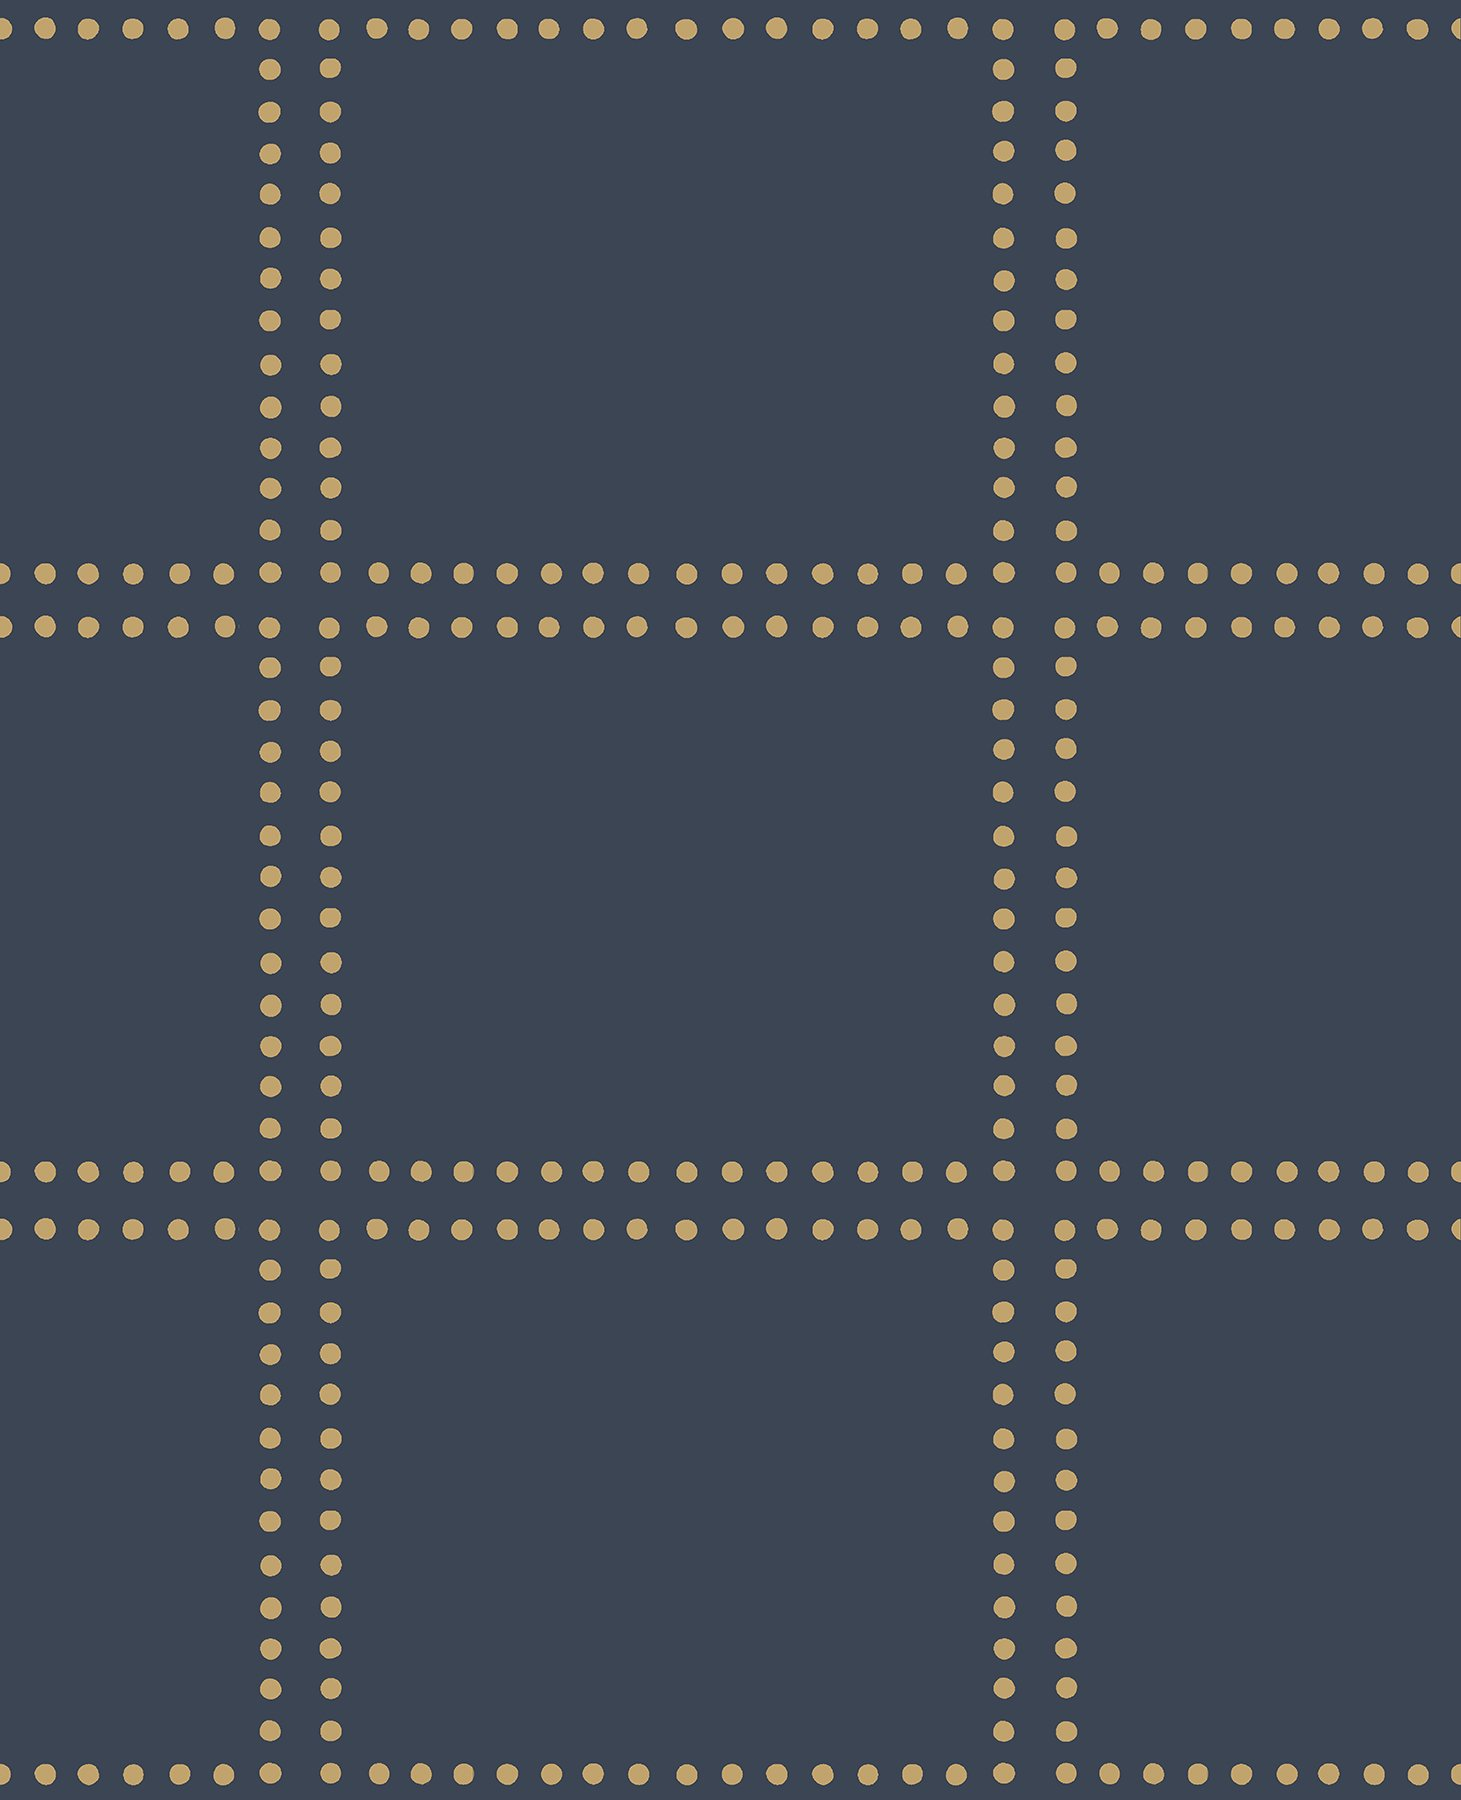 A-Street Prints 2697-22644 Gridlock Navy Geometric Wallpaper, by A-Street Prints (Image #1)